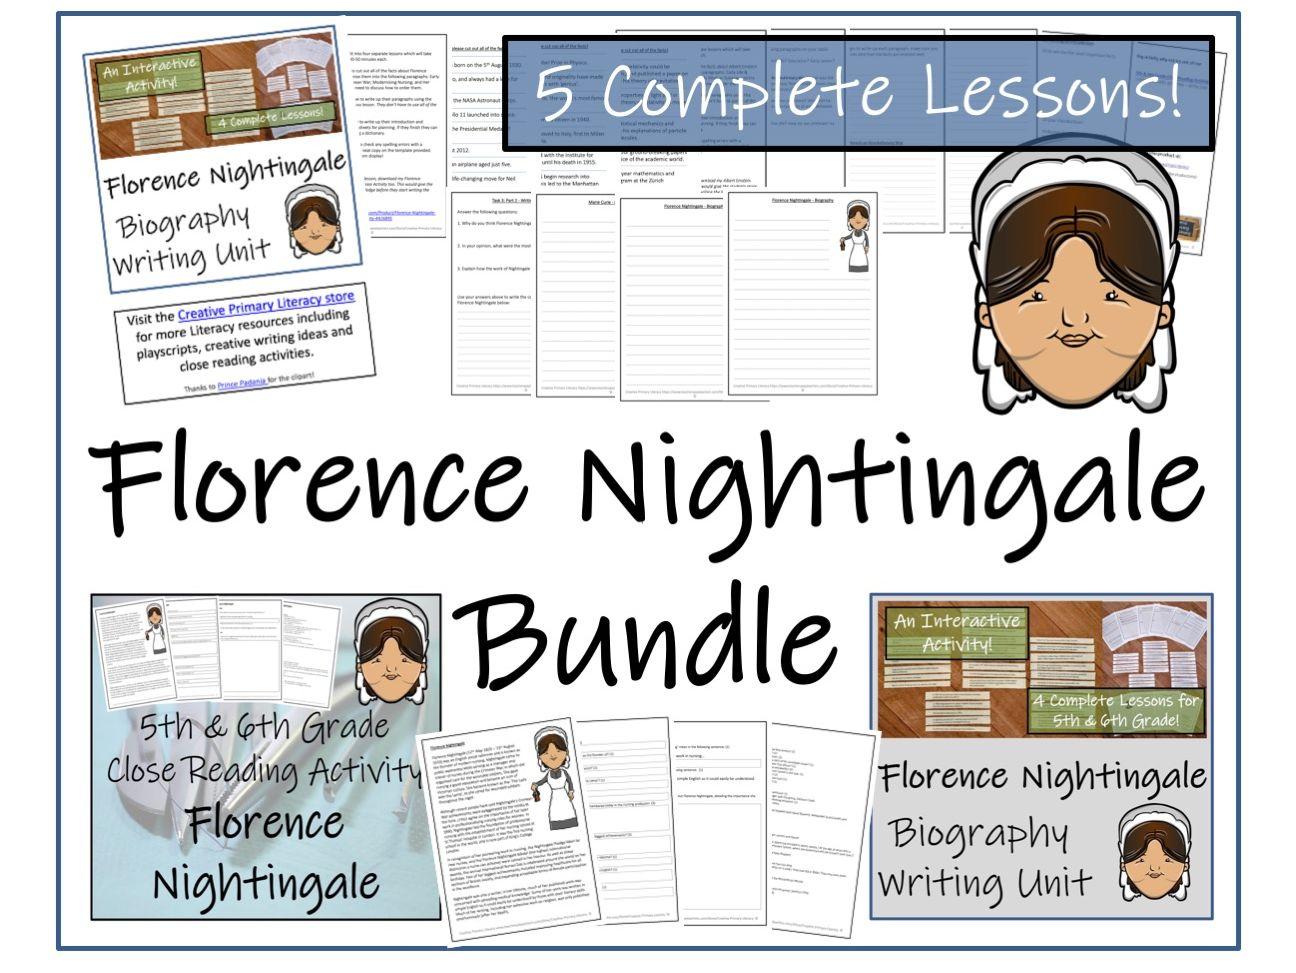 UKS2 History - Bundle of Florence Nightingale Activities